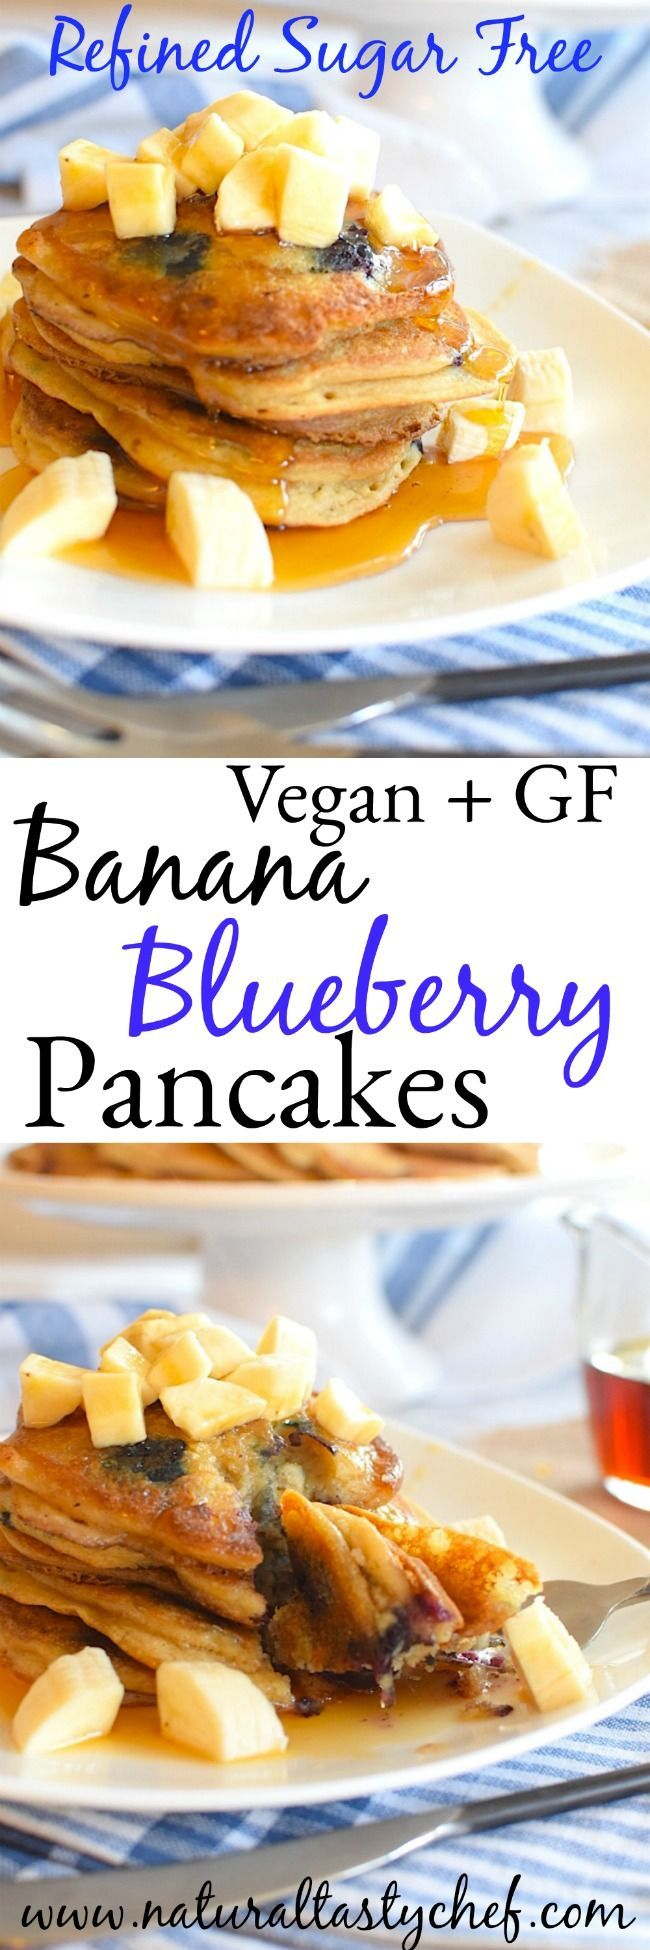 Vegan and Gluten Free Banana, Blueberry Pancakes.  No Refined Sugar.  Gluten Free, Dairy Free, Soy Free, Nut Free, #glutenfree, #vegan, #soyfree, #dairyfree